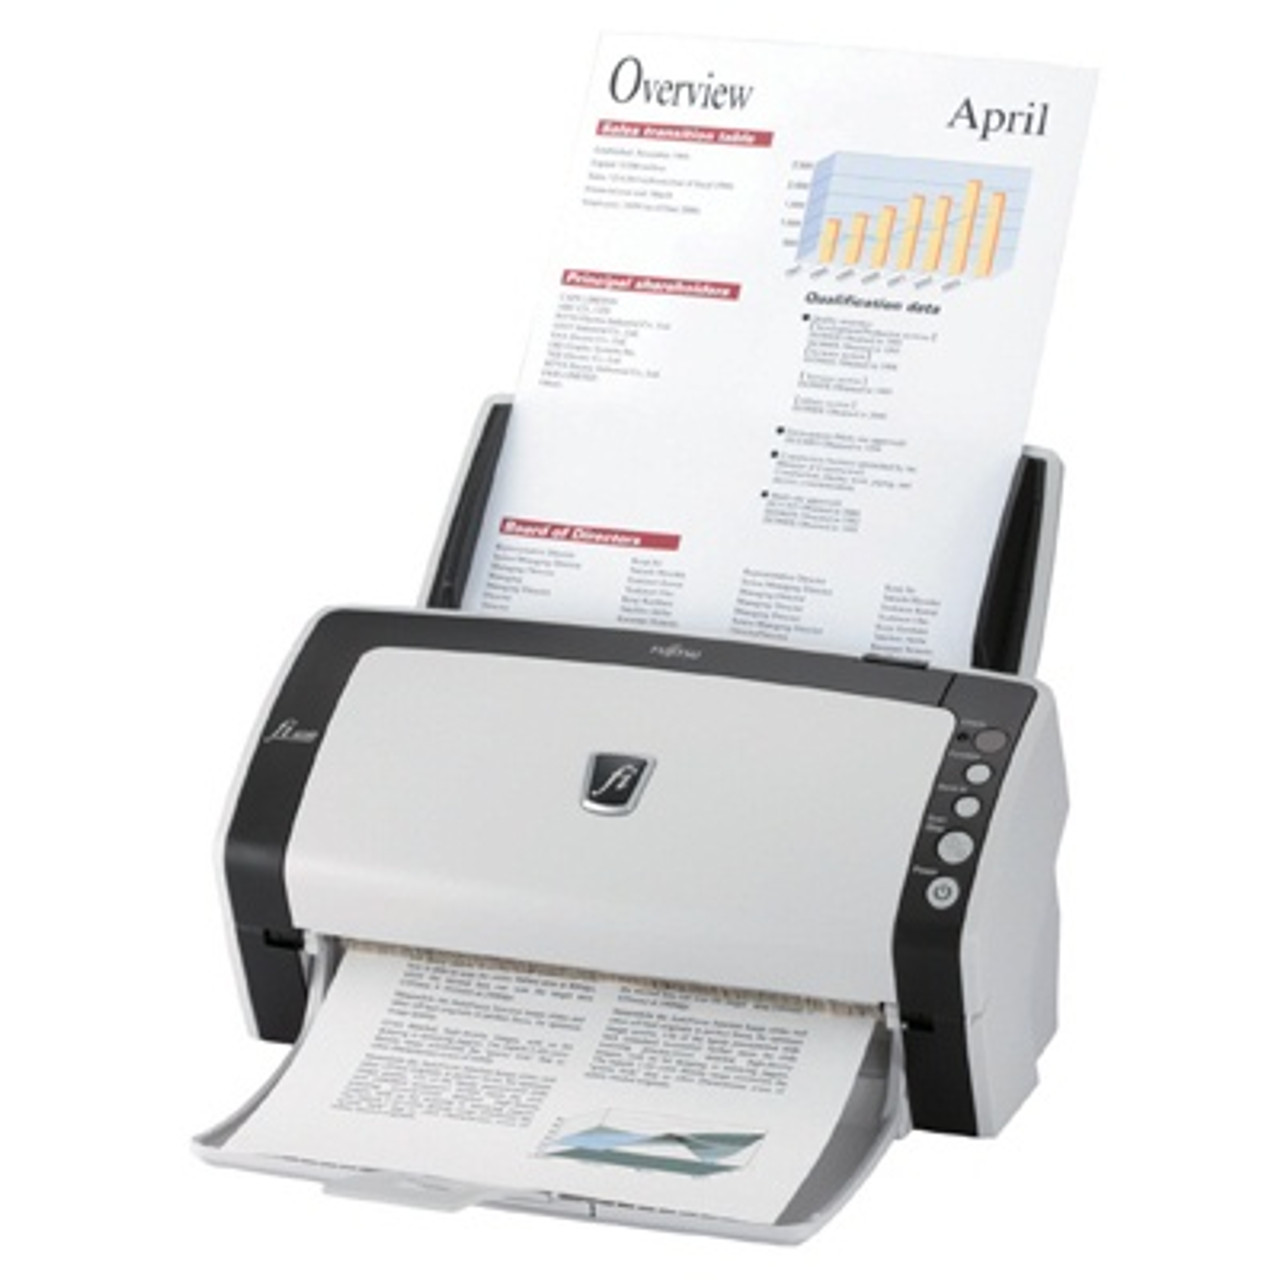 Fujitsu fi 6140C - 600 dpi x 600 dpi - Document scanner